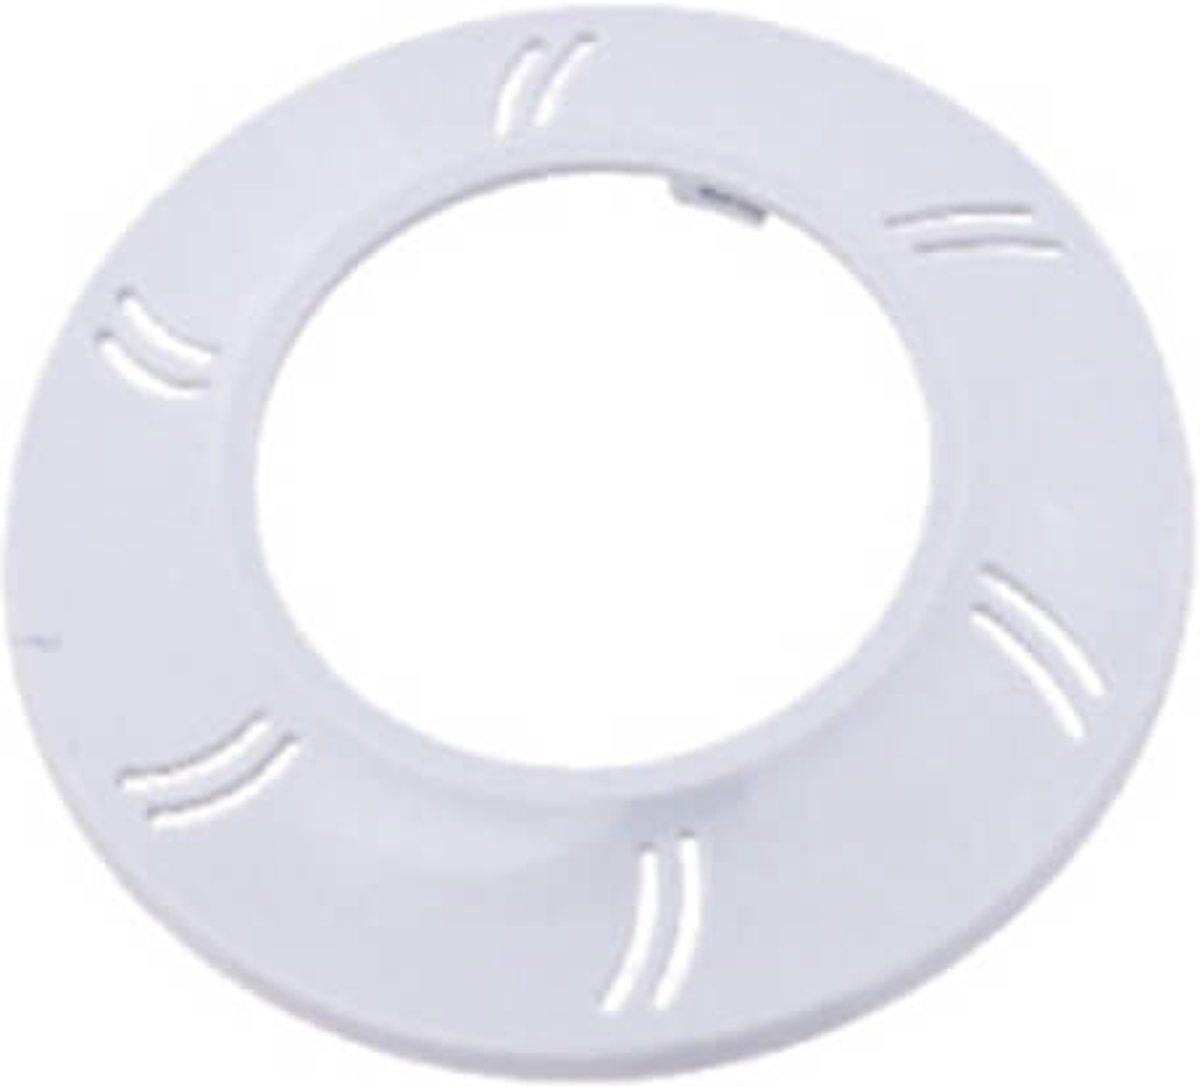 Witte front ring voor afdekking LED lamp